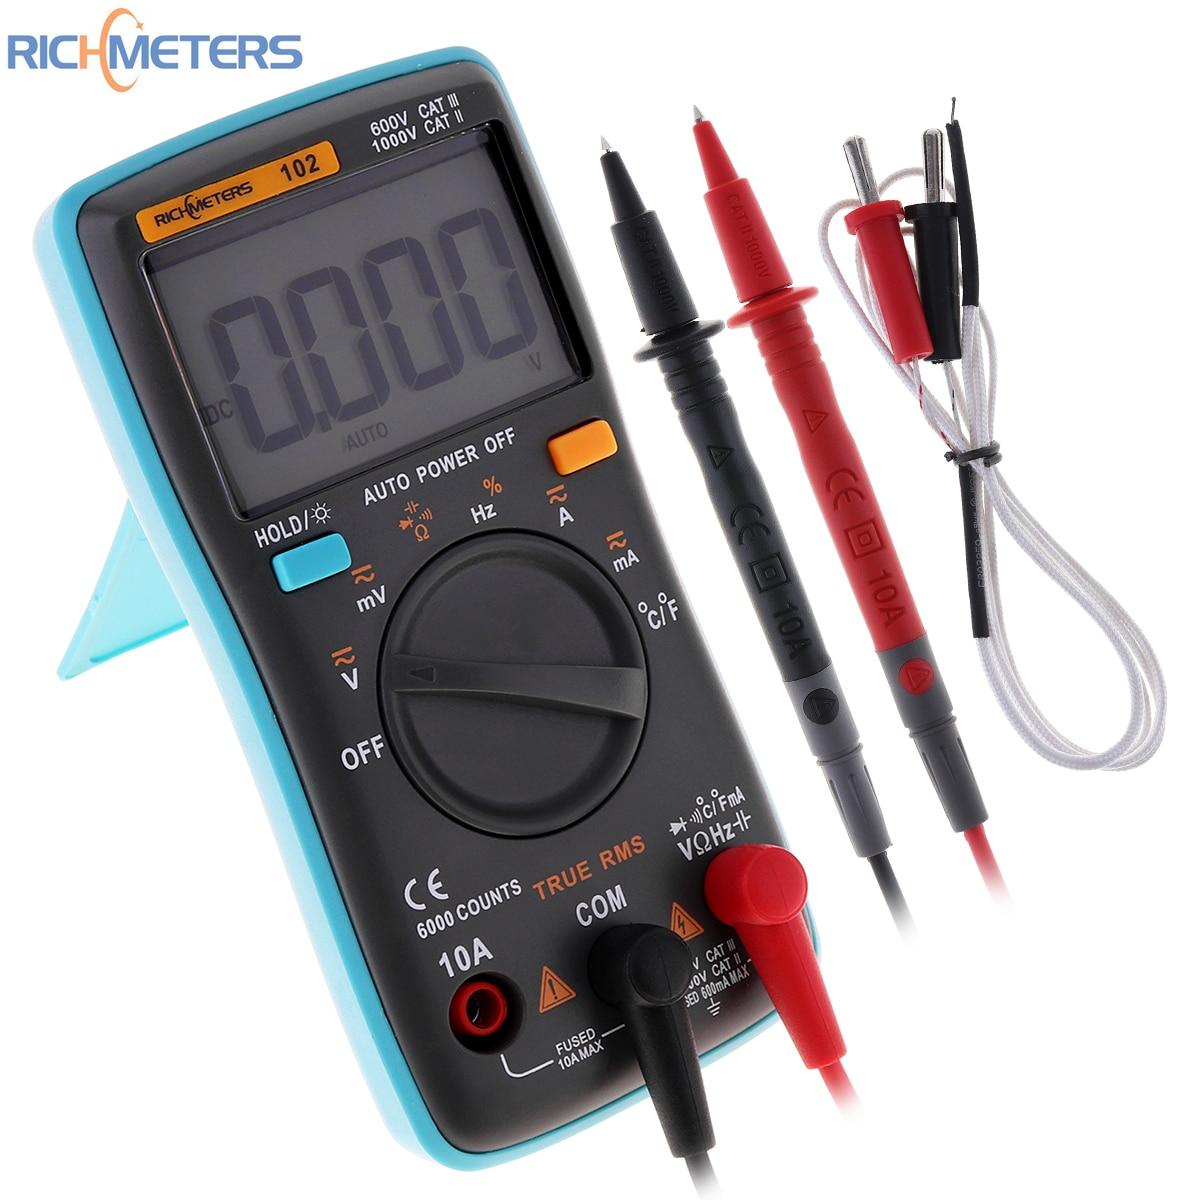 RICHMETERS RM102 Multimeter AC/DC Amperemeter 6000 Zählt Voltmeter Ohm Frequenz Diode mit Temperatur-test-funktion